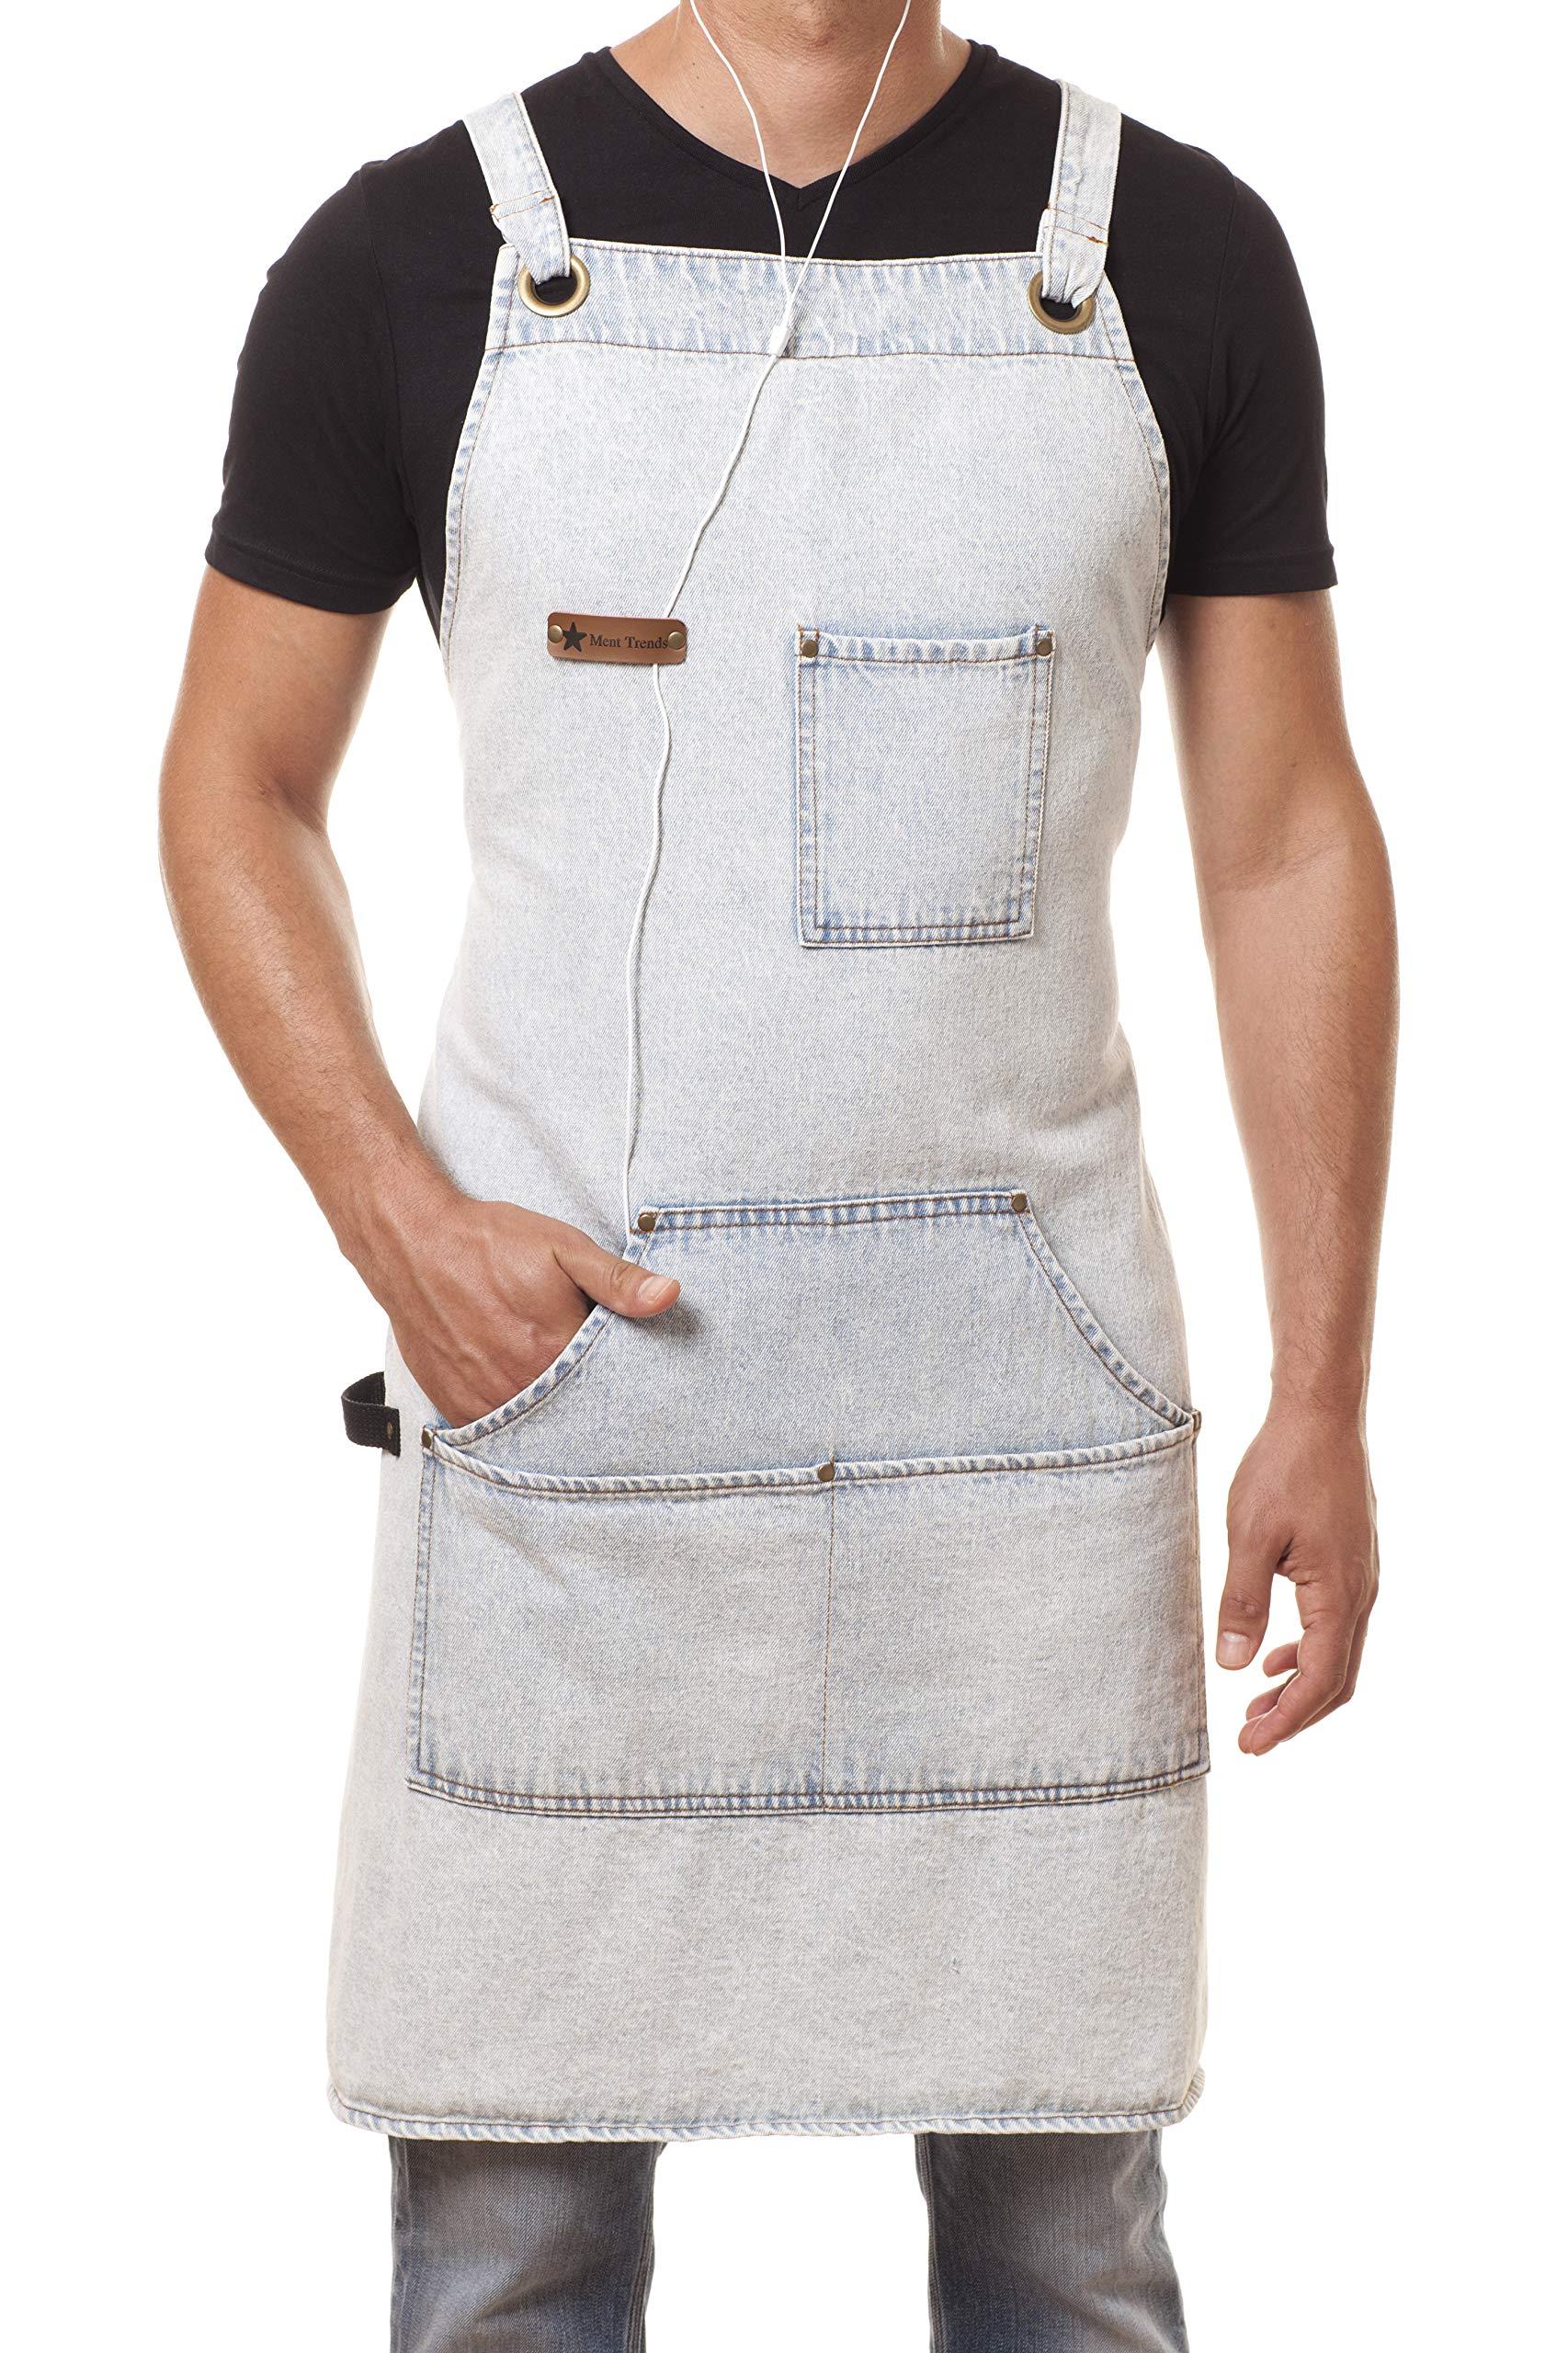 ARAWAK BRAVE Distressed Denim Apron Chef Kitchen BBQ Grill Light Blue Towel Loop + Quick Release Buckle + Tool Pockets Adjustable M to XXL